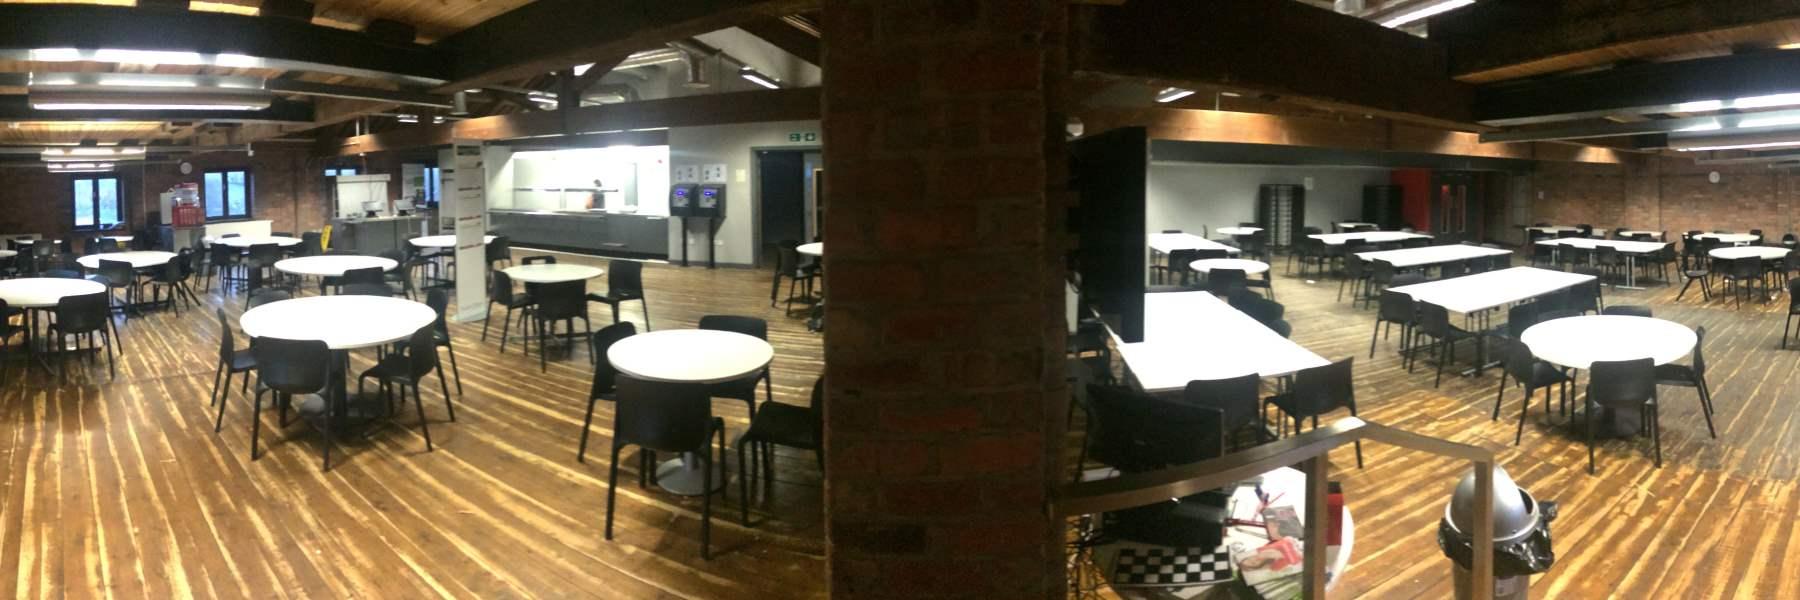 Liverpool UTC cafe m.jpg